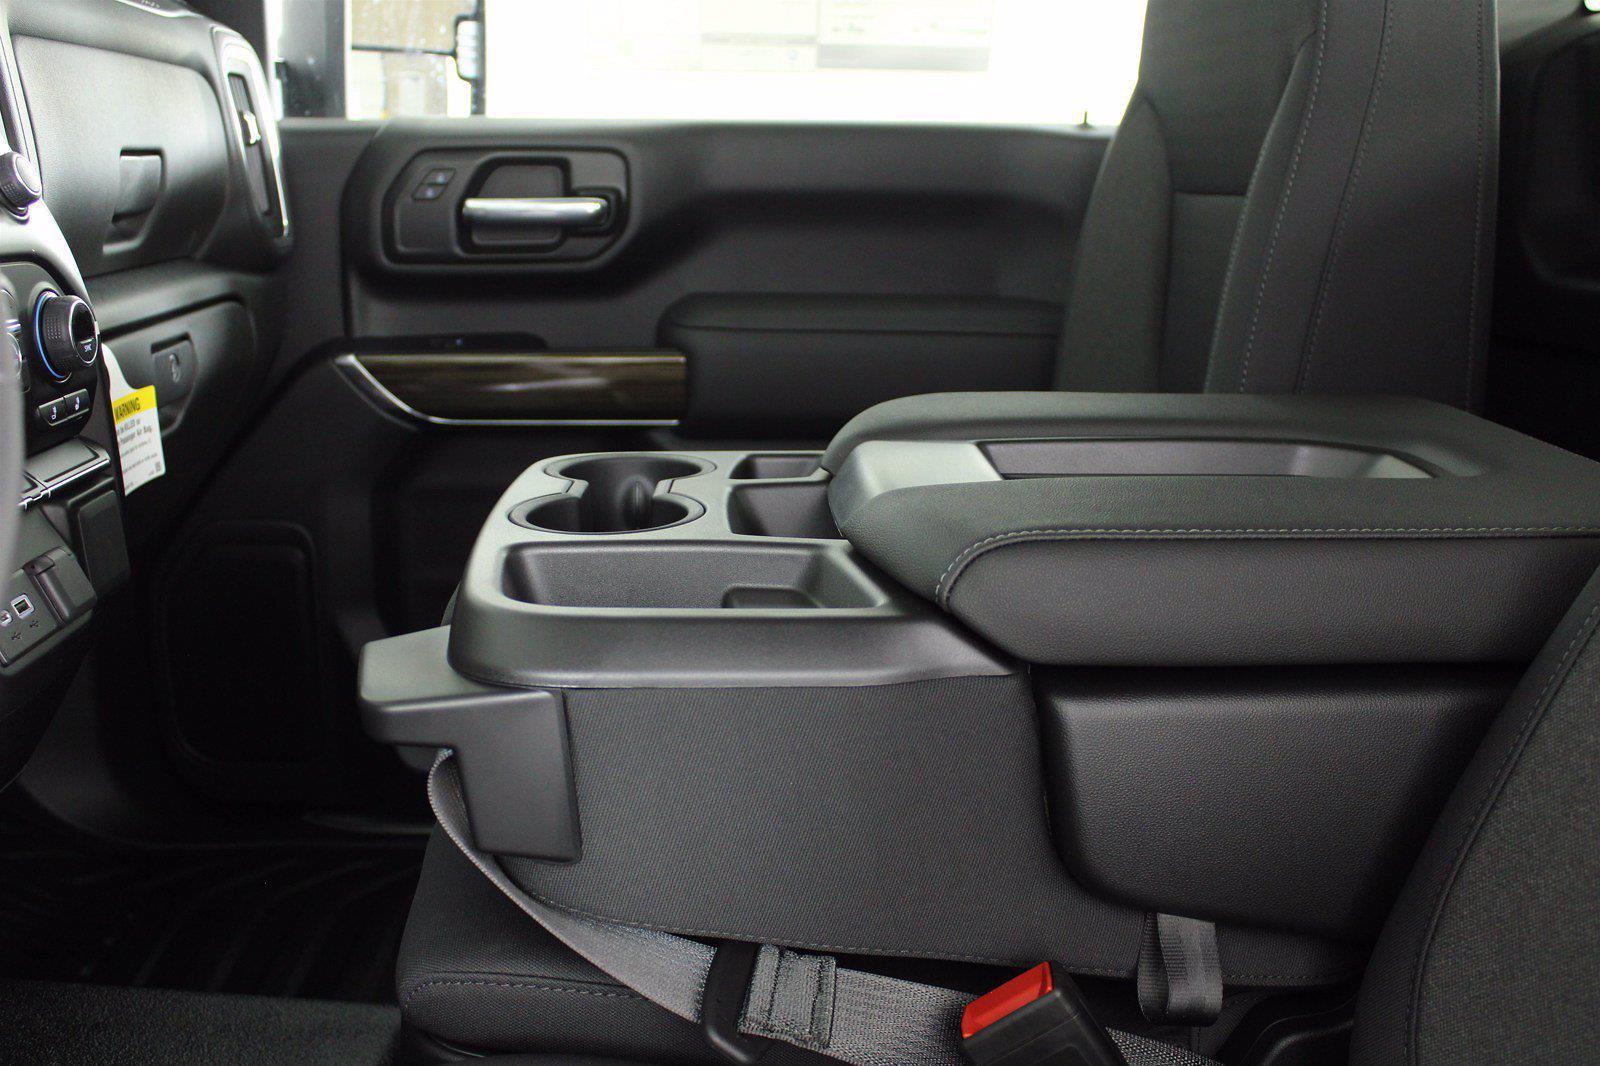 2022 Silverado 2500 Regular Cab 4x4,  Pickup #D120035 - photo 13